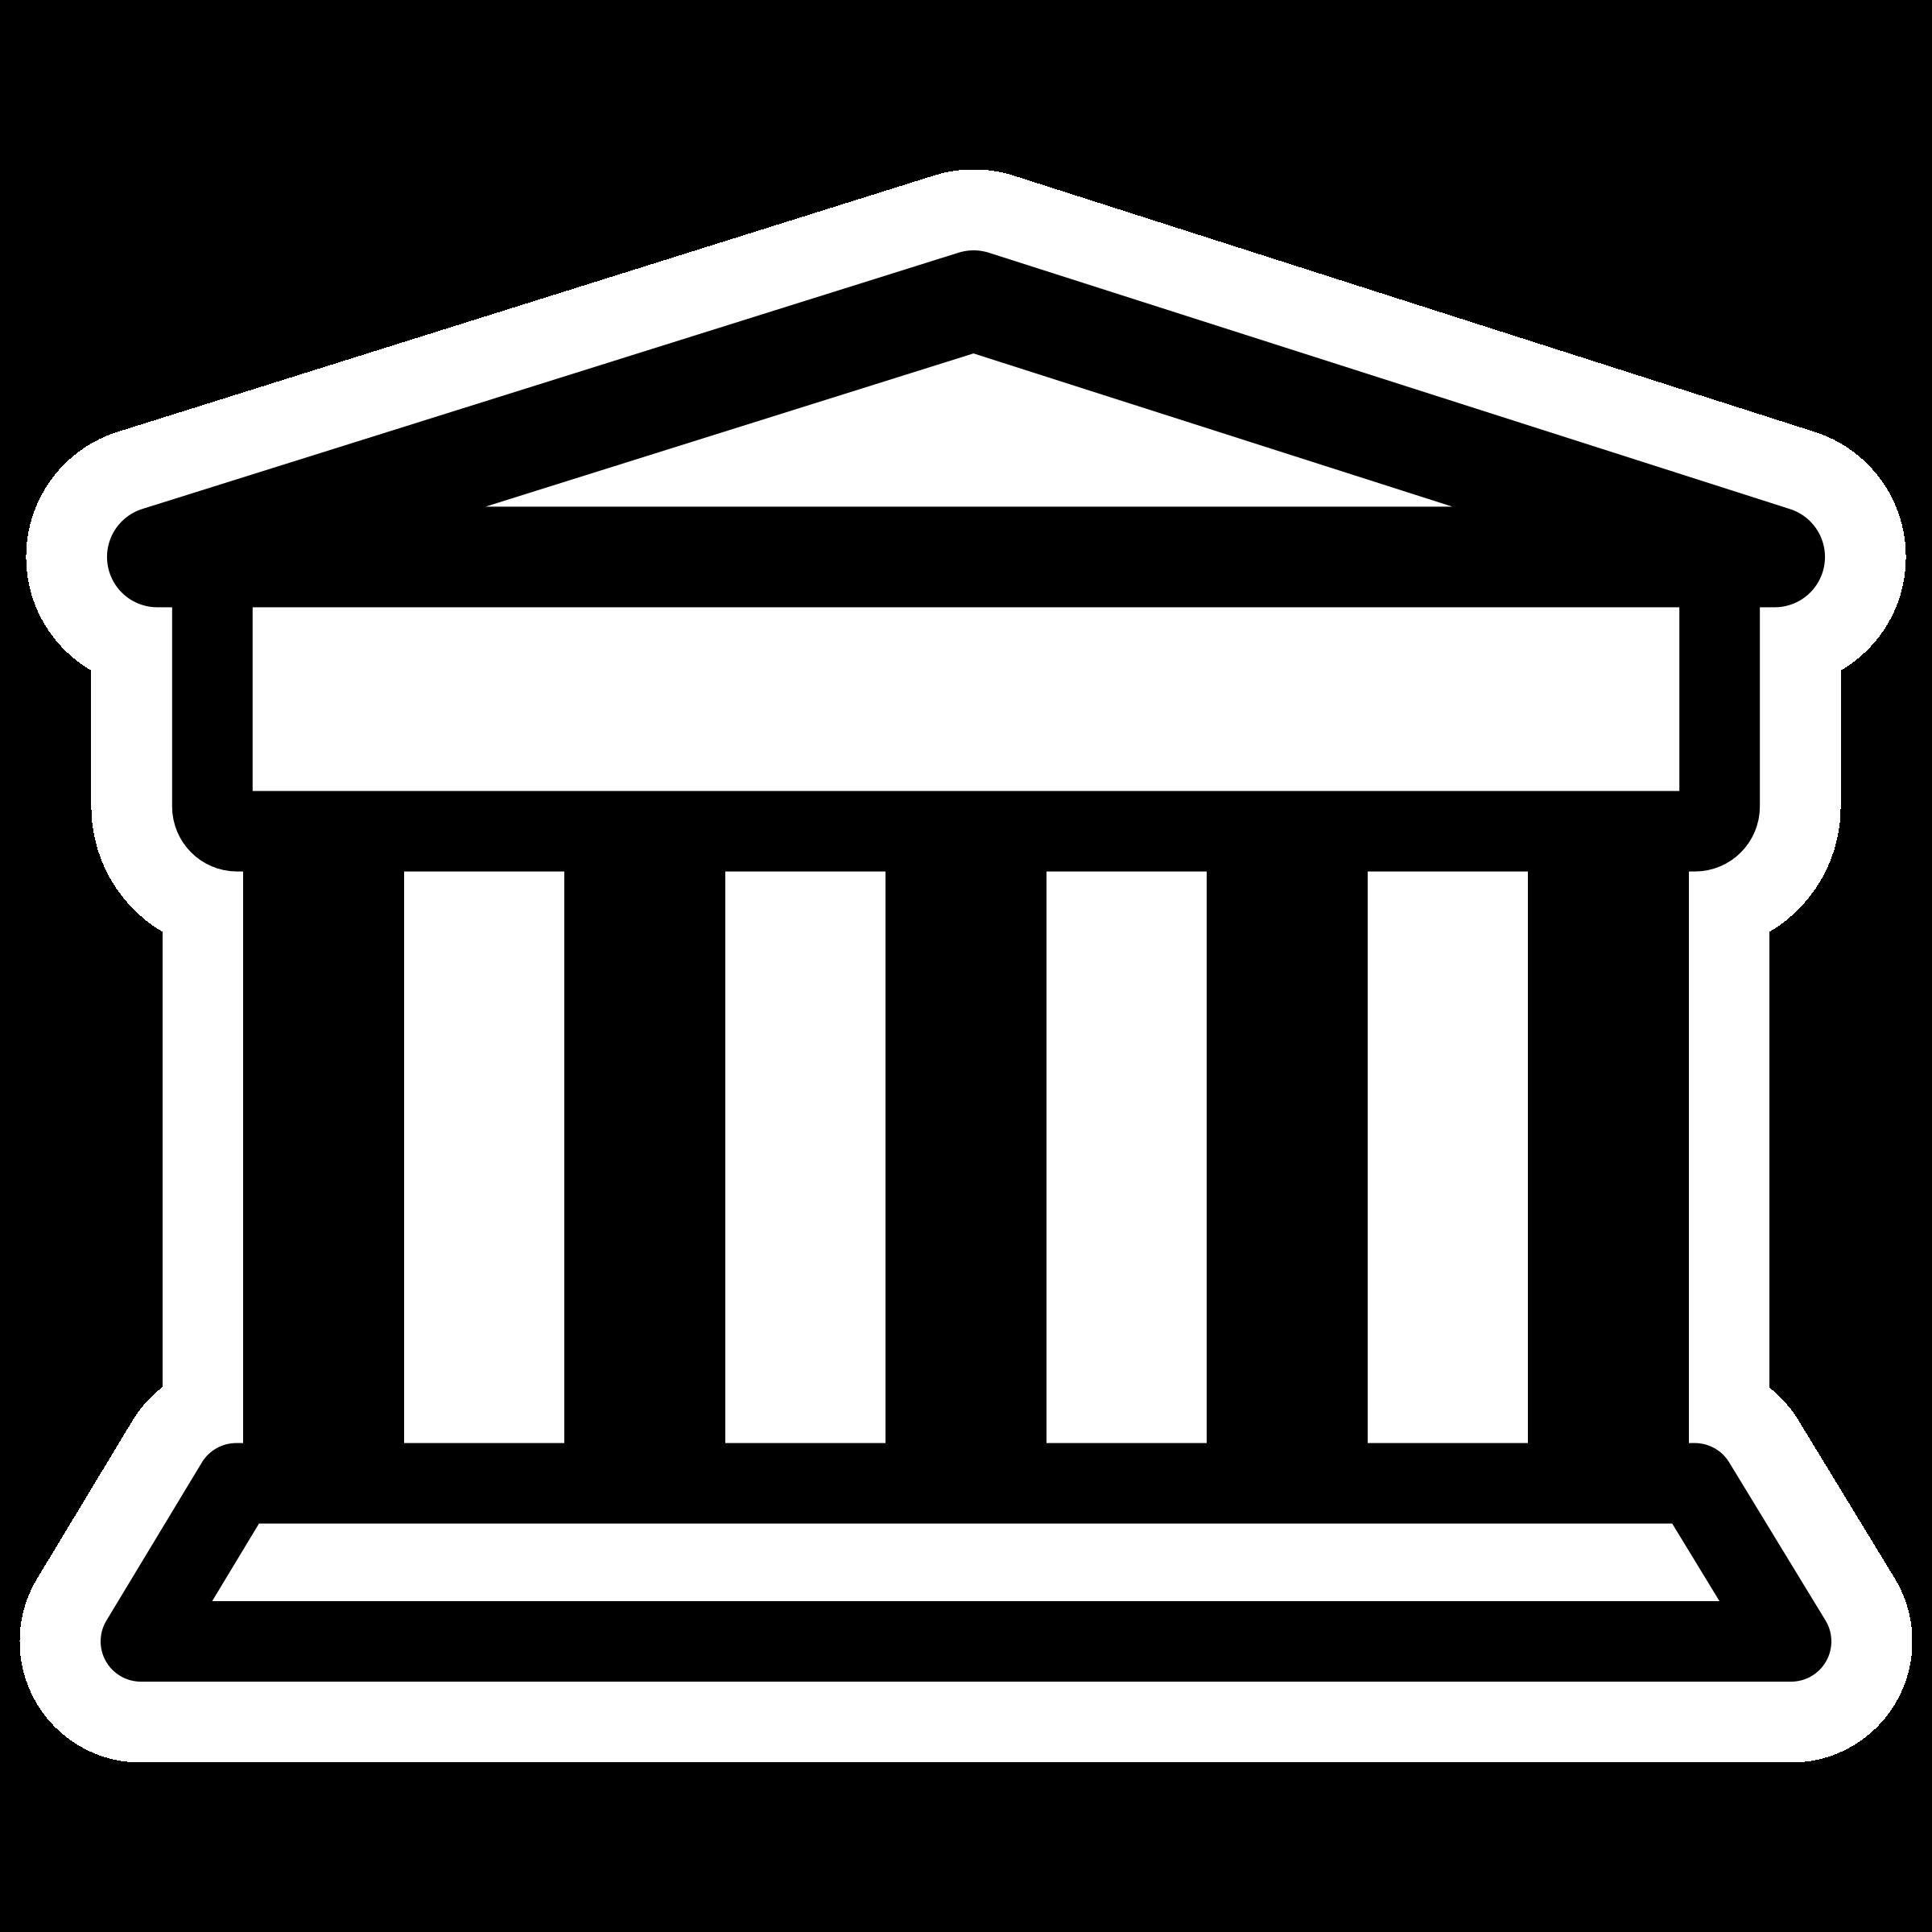 Банк картинки вектор